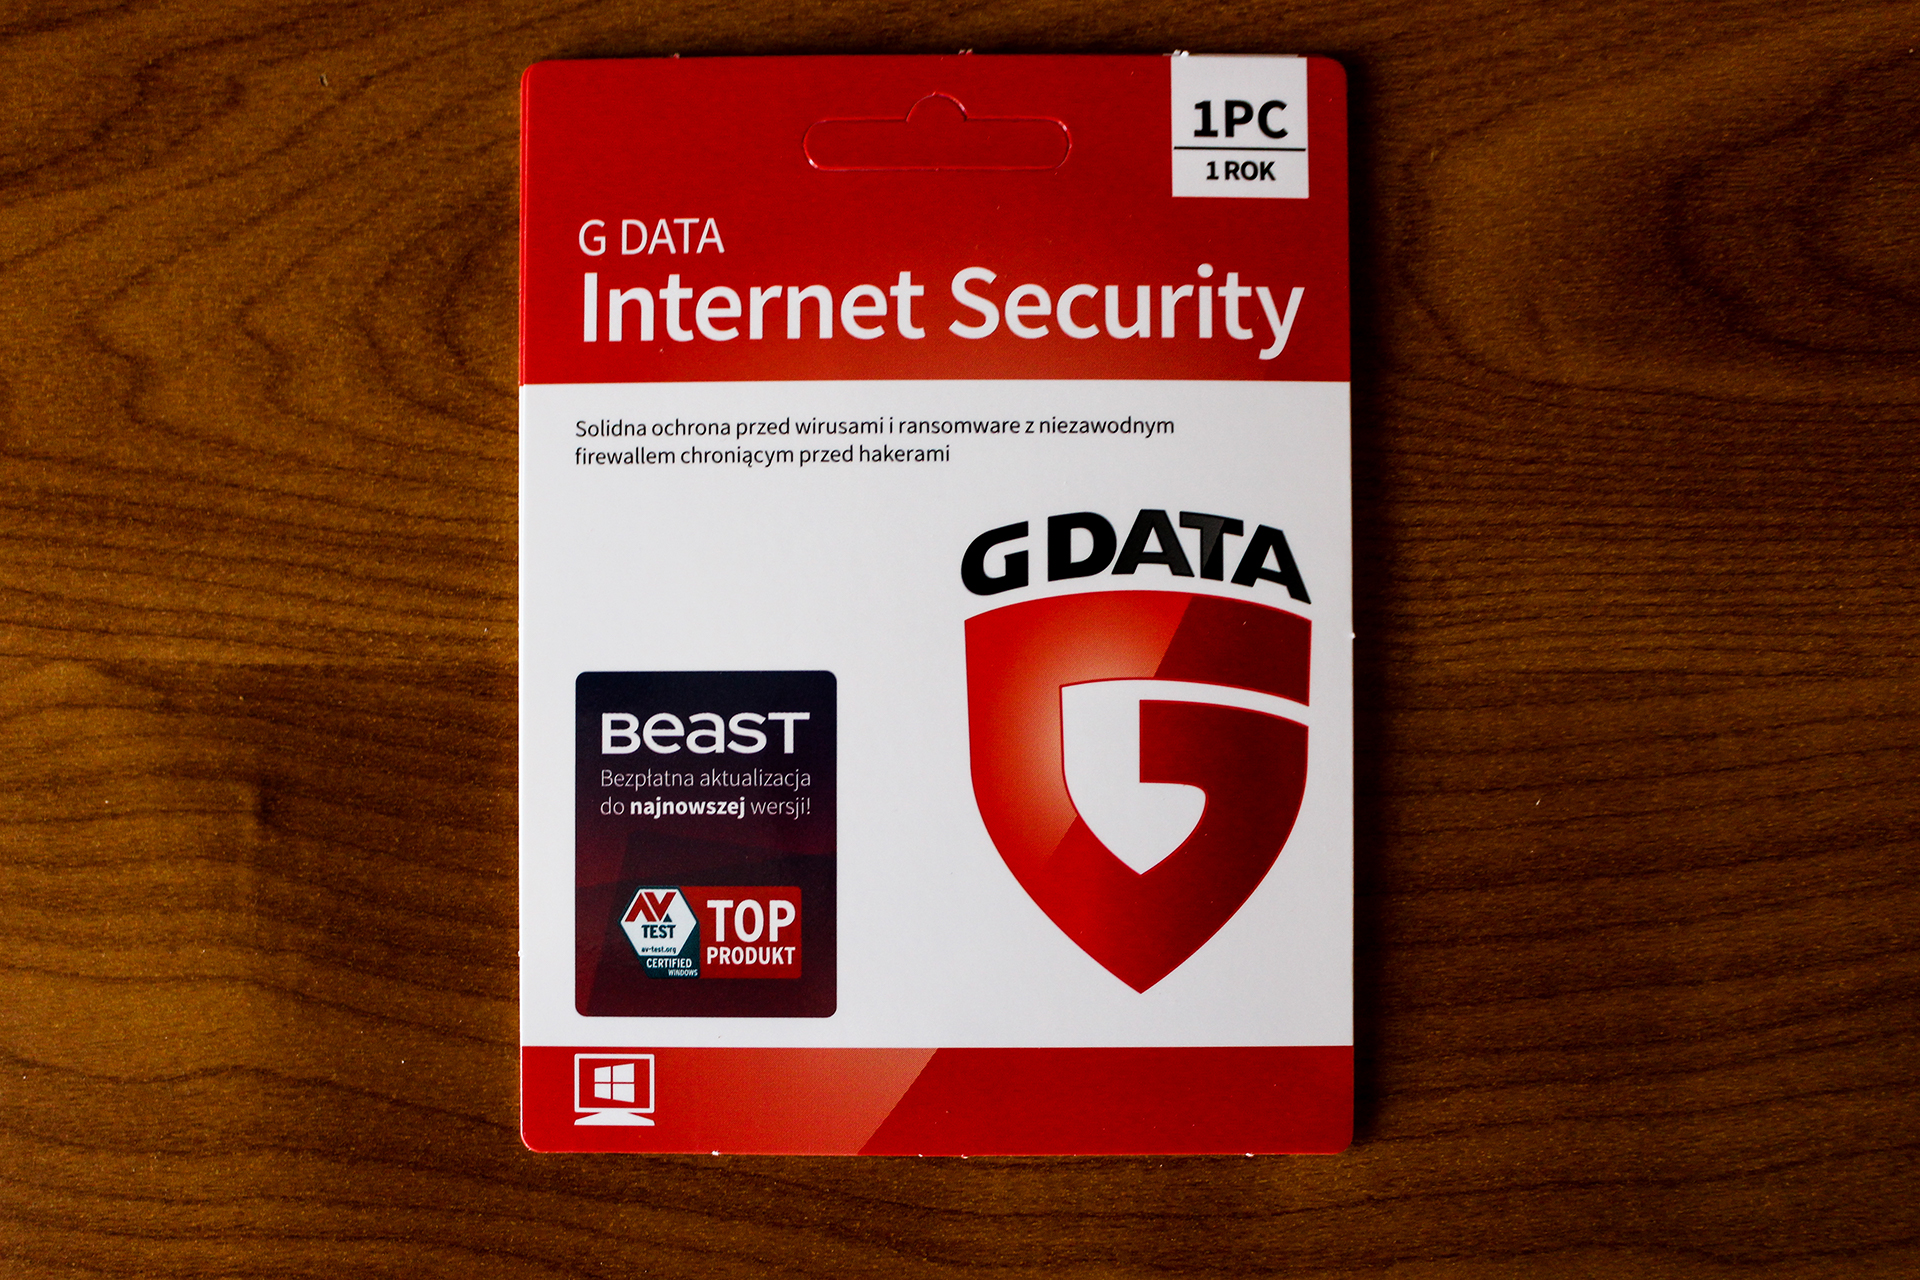 G DATA INTERNET SECURITY 1PC 1 ROK